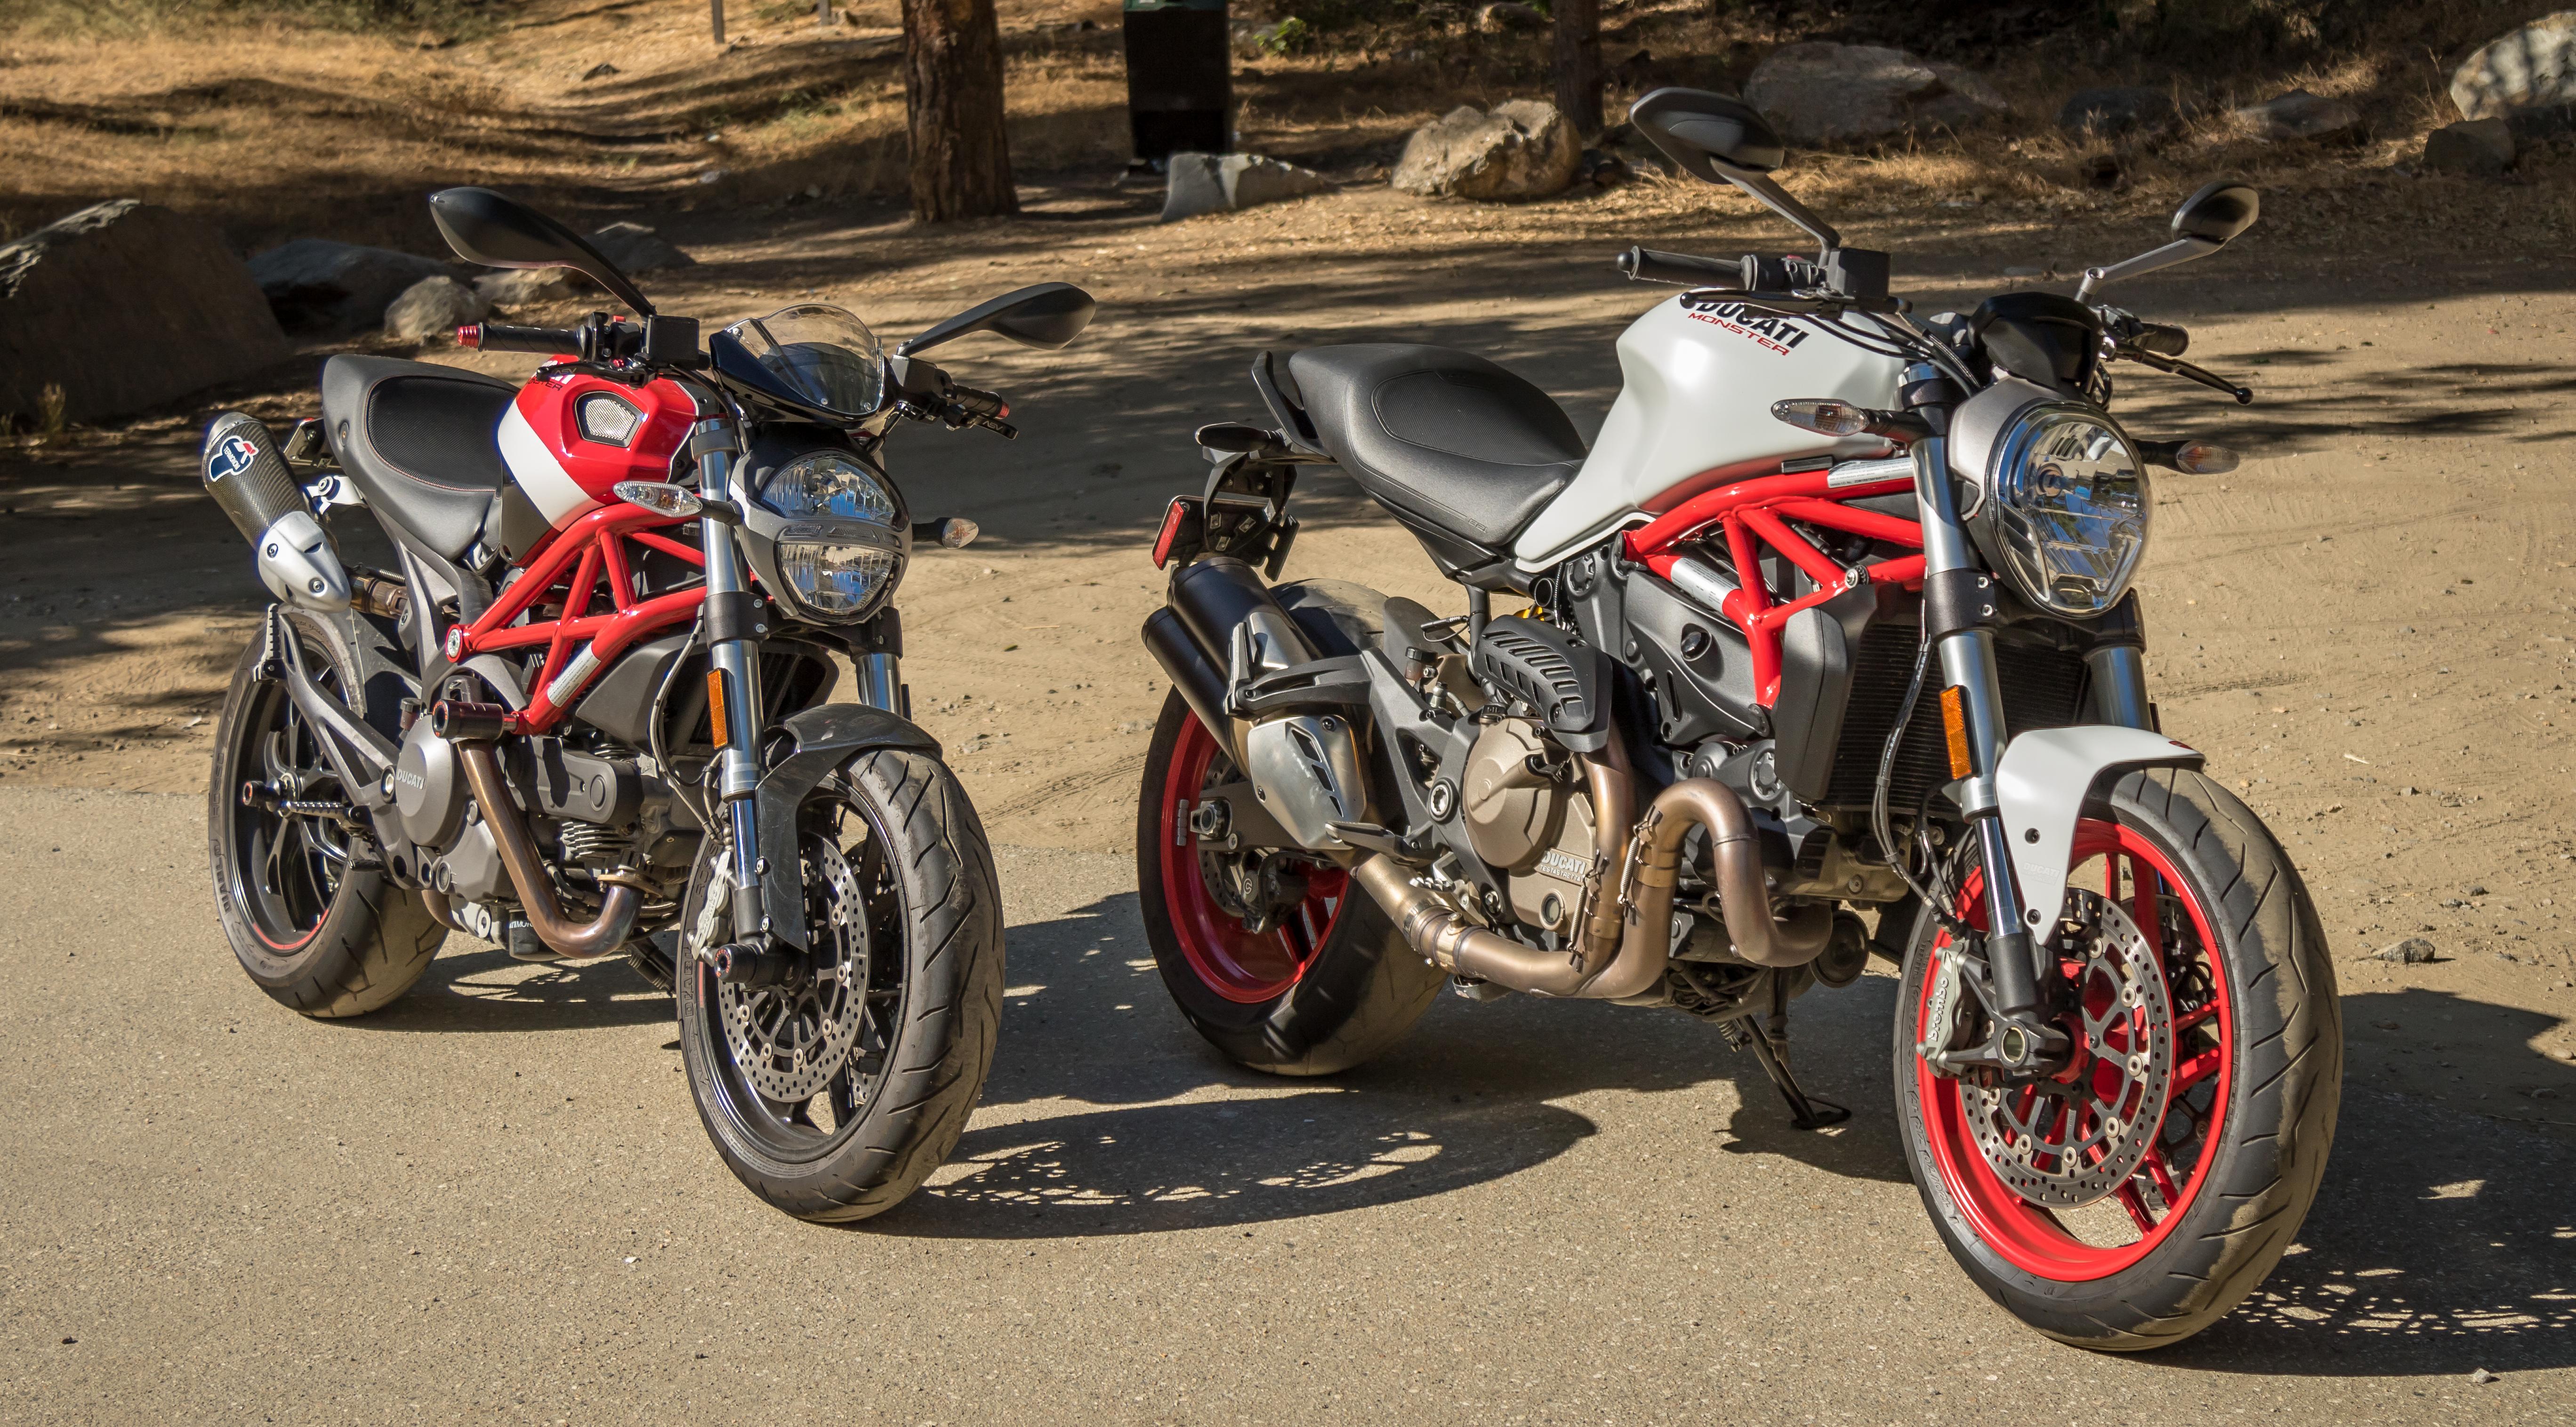 2015 Ducati Monster 821 review - RevZilla